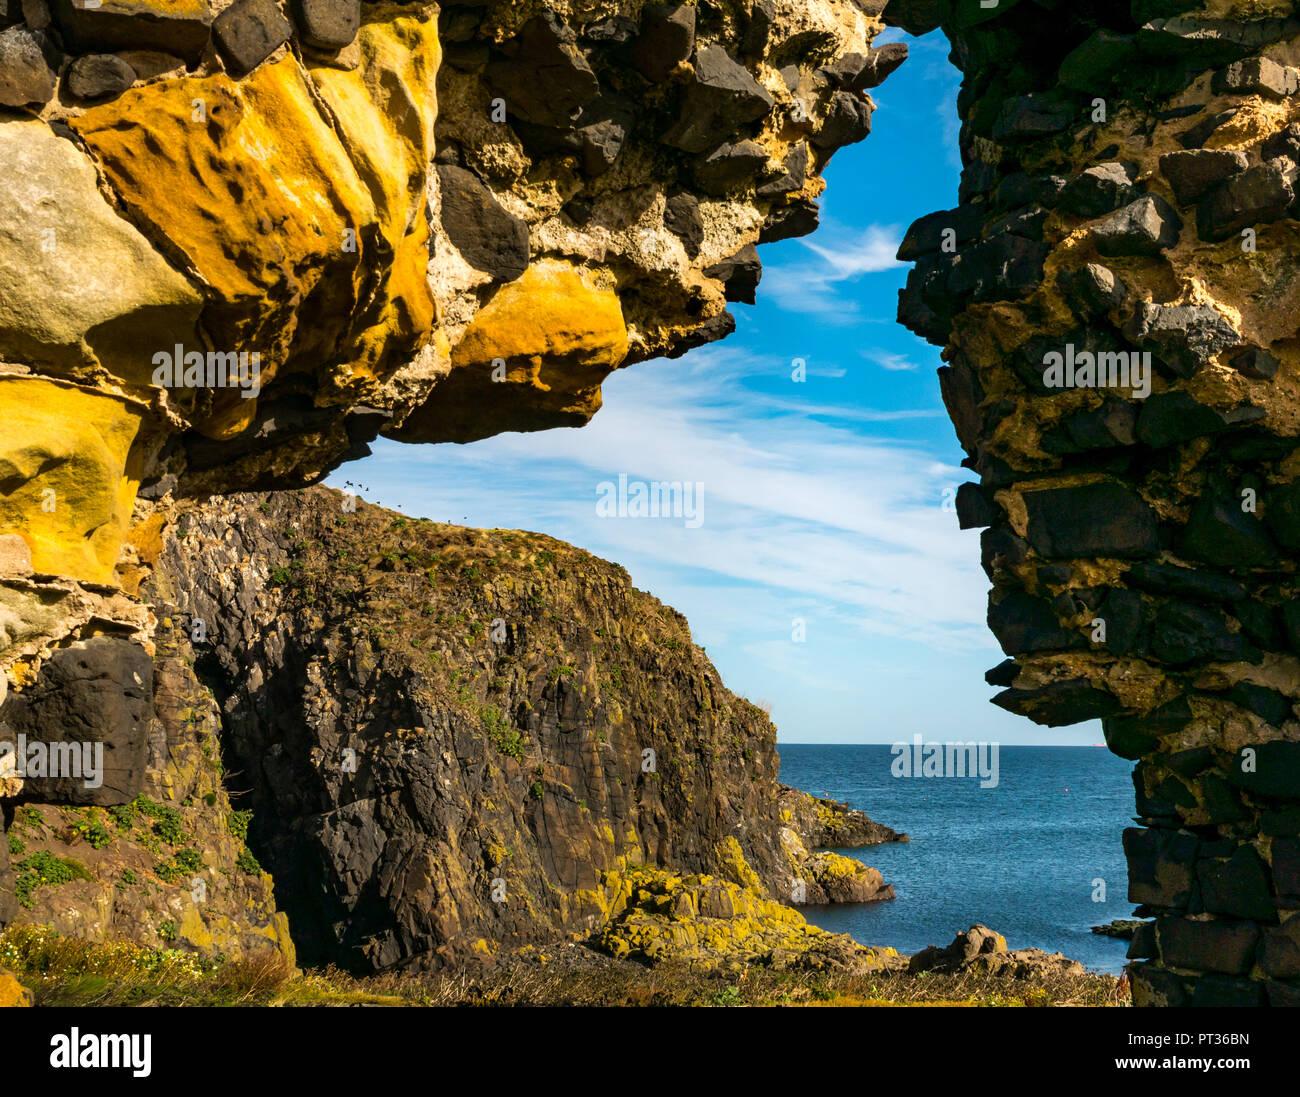 Natural sea hole named Lady's veil, Fidra Island, Firth of Forth, East Lothian, Scotland, UK - Stock Image